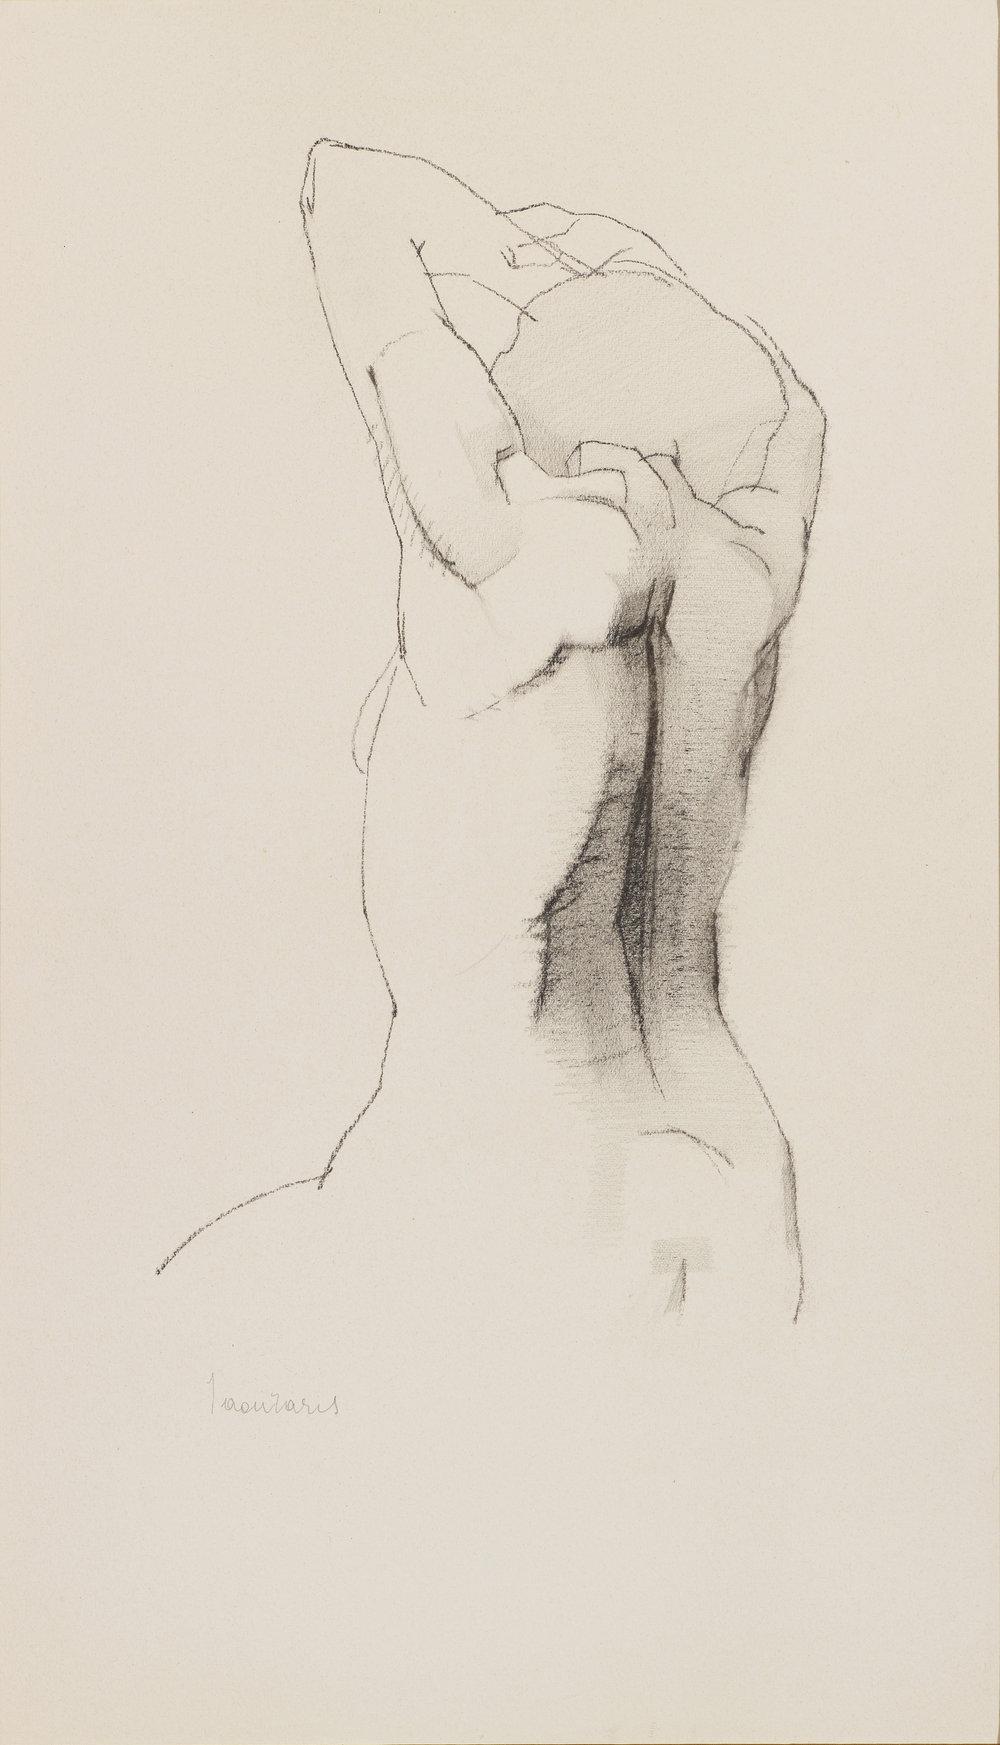 Untitled,  1950s  46 cm x 26 cm